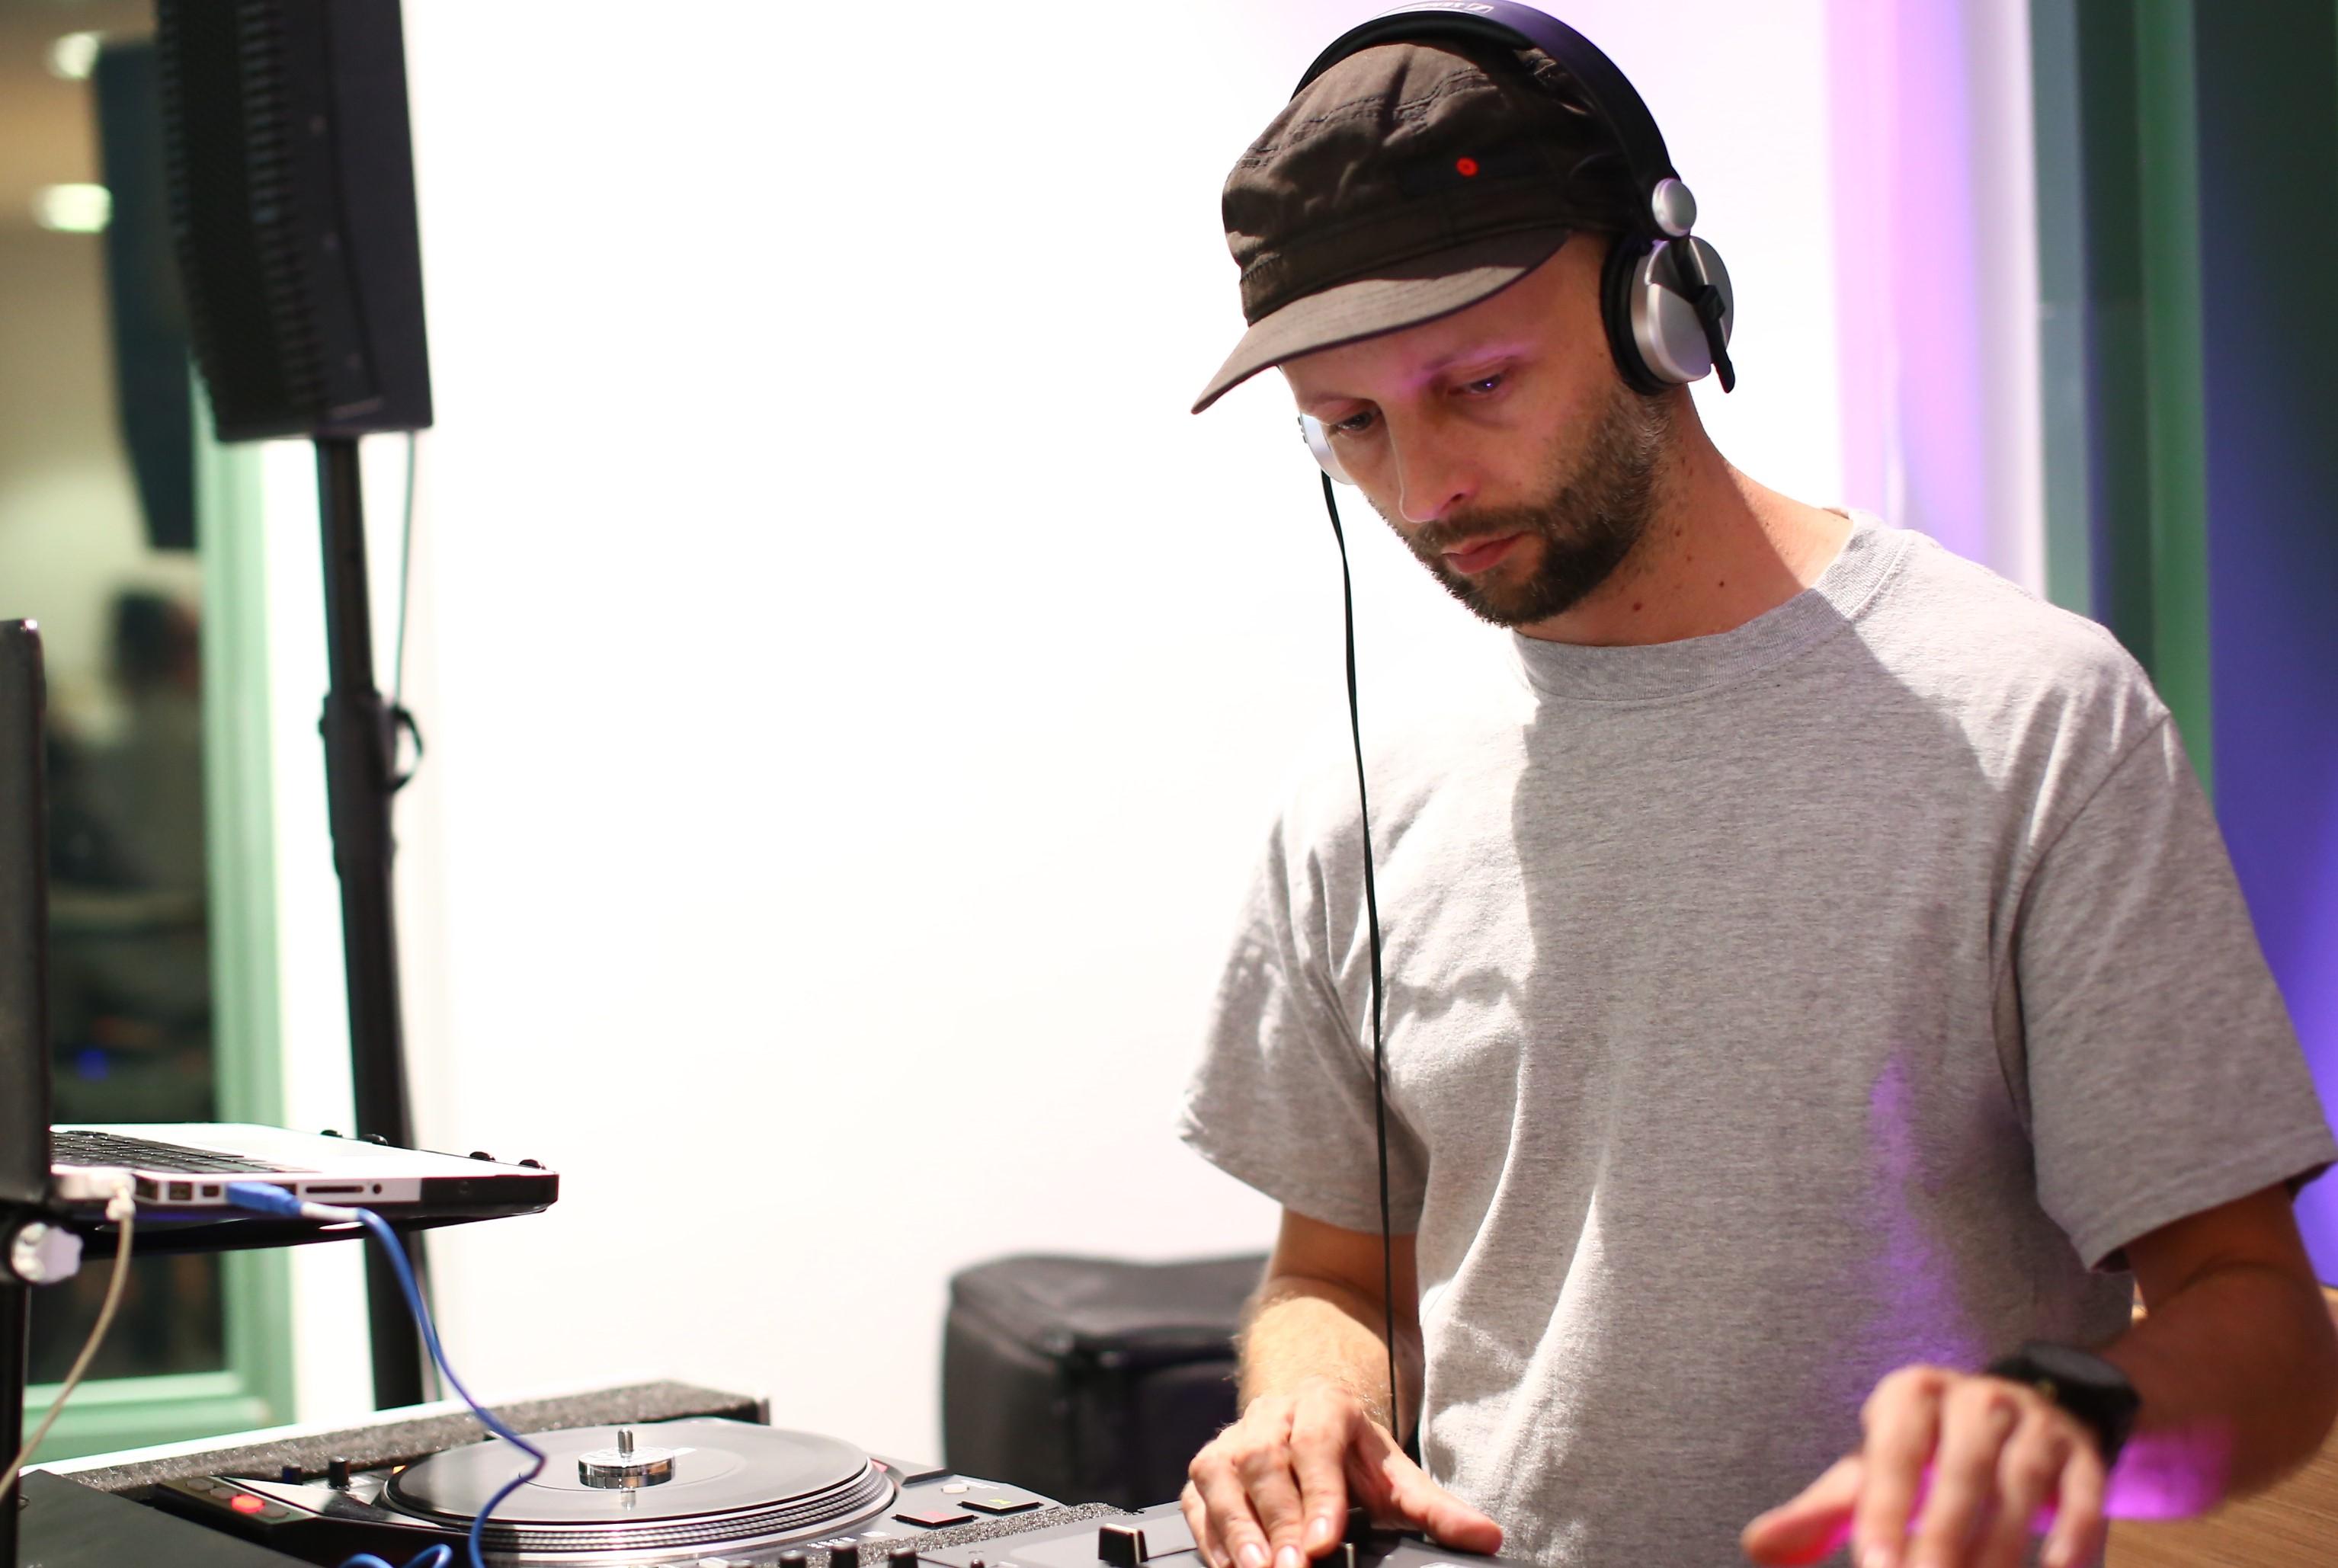 DJ Tom Shellsuit